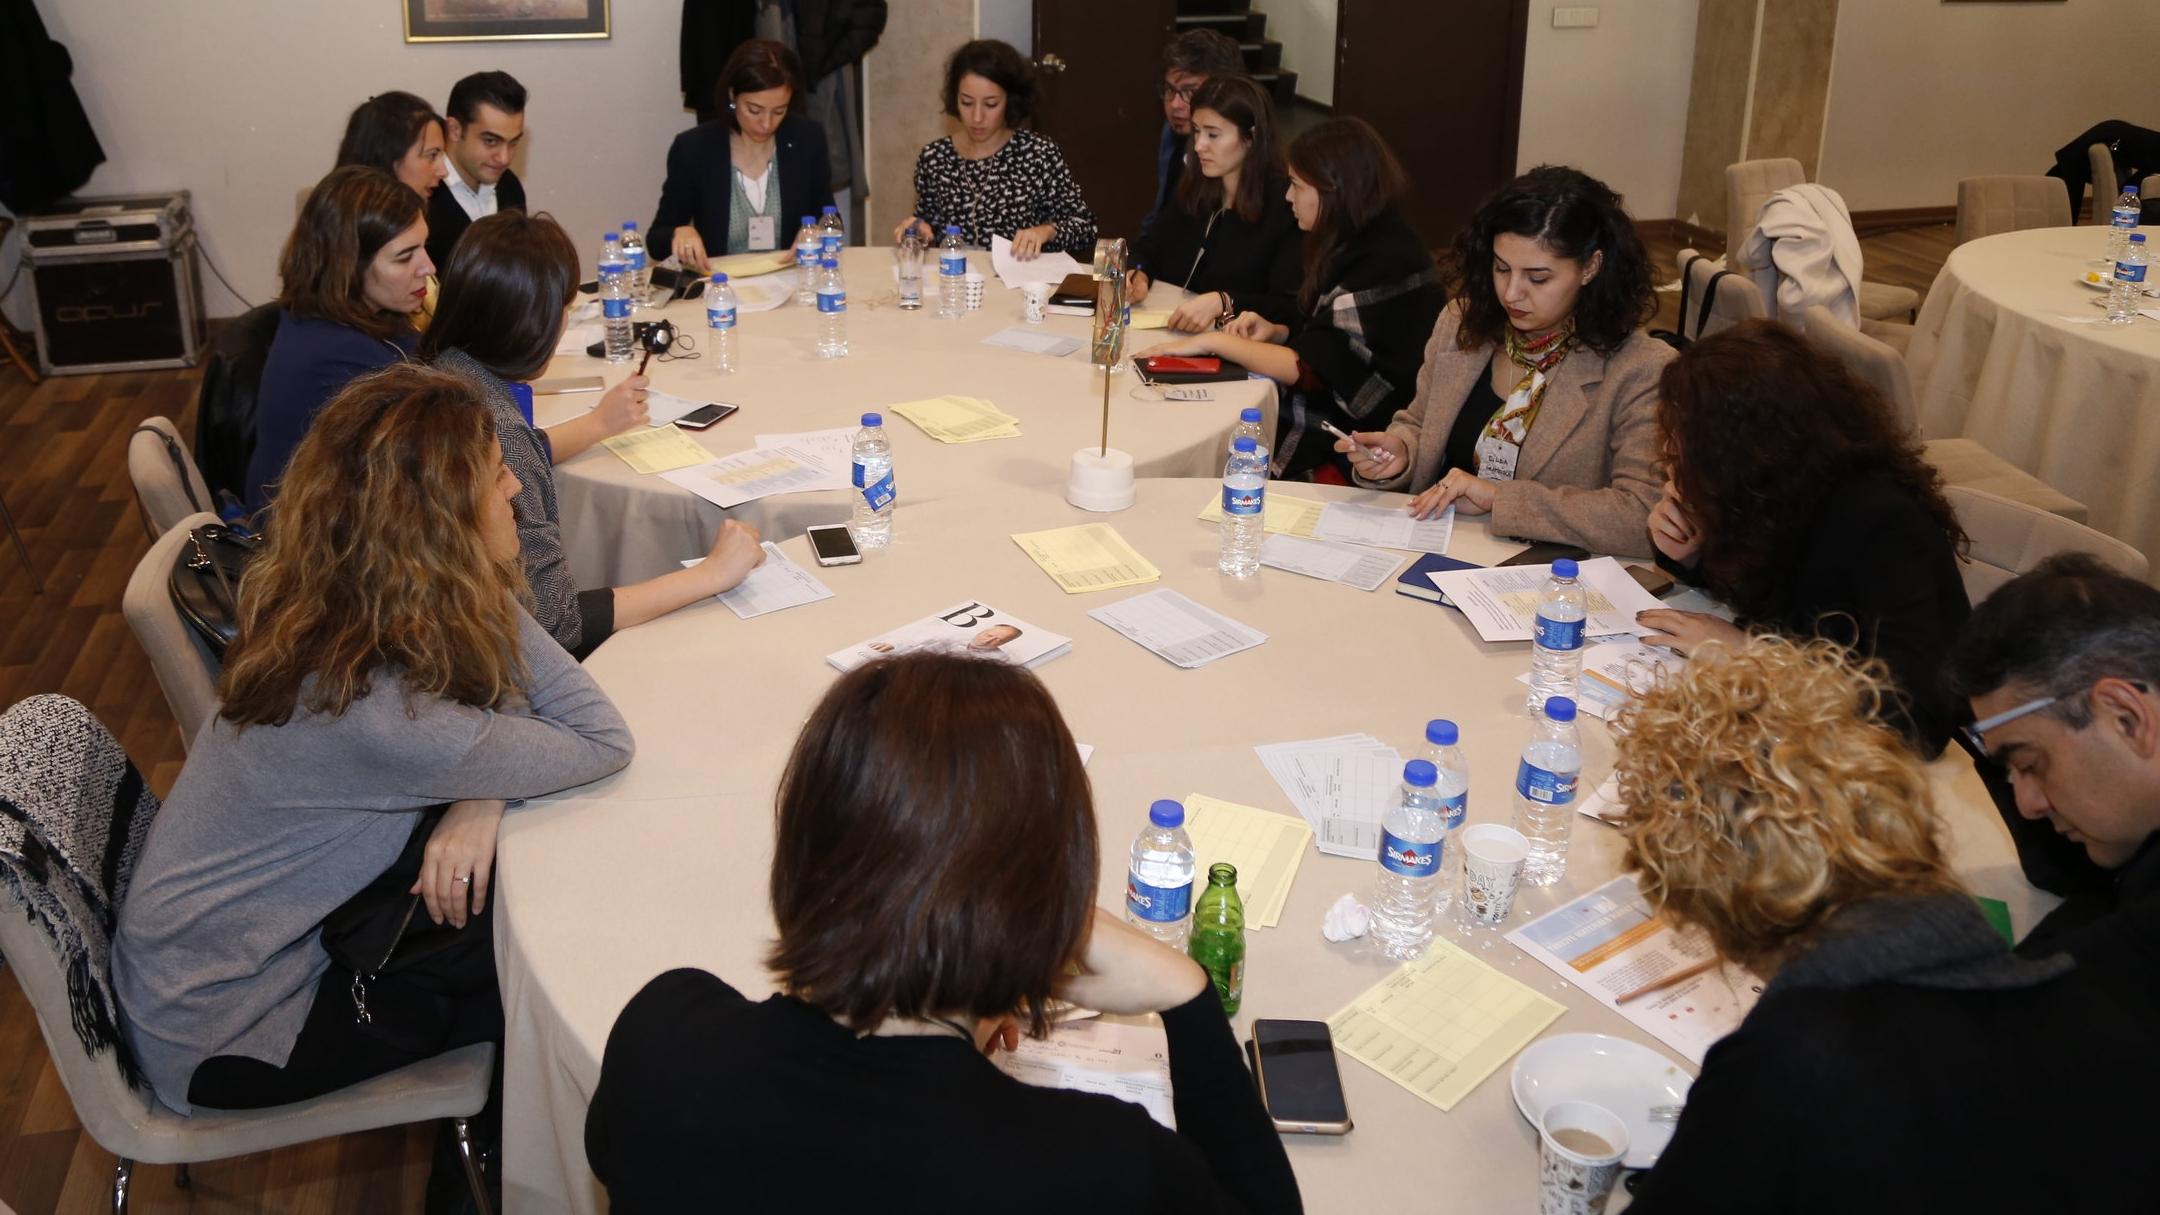 materials-marketplace-turkiye-etkilesim-toplantisi-workshop1.JPG